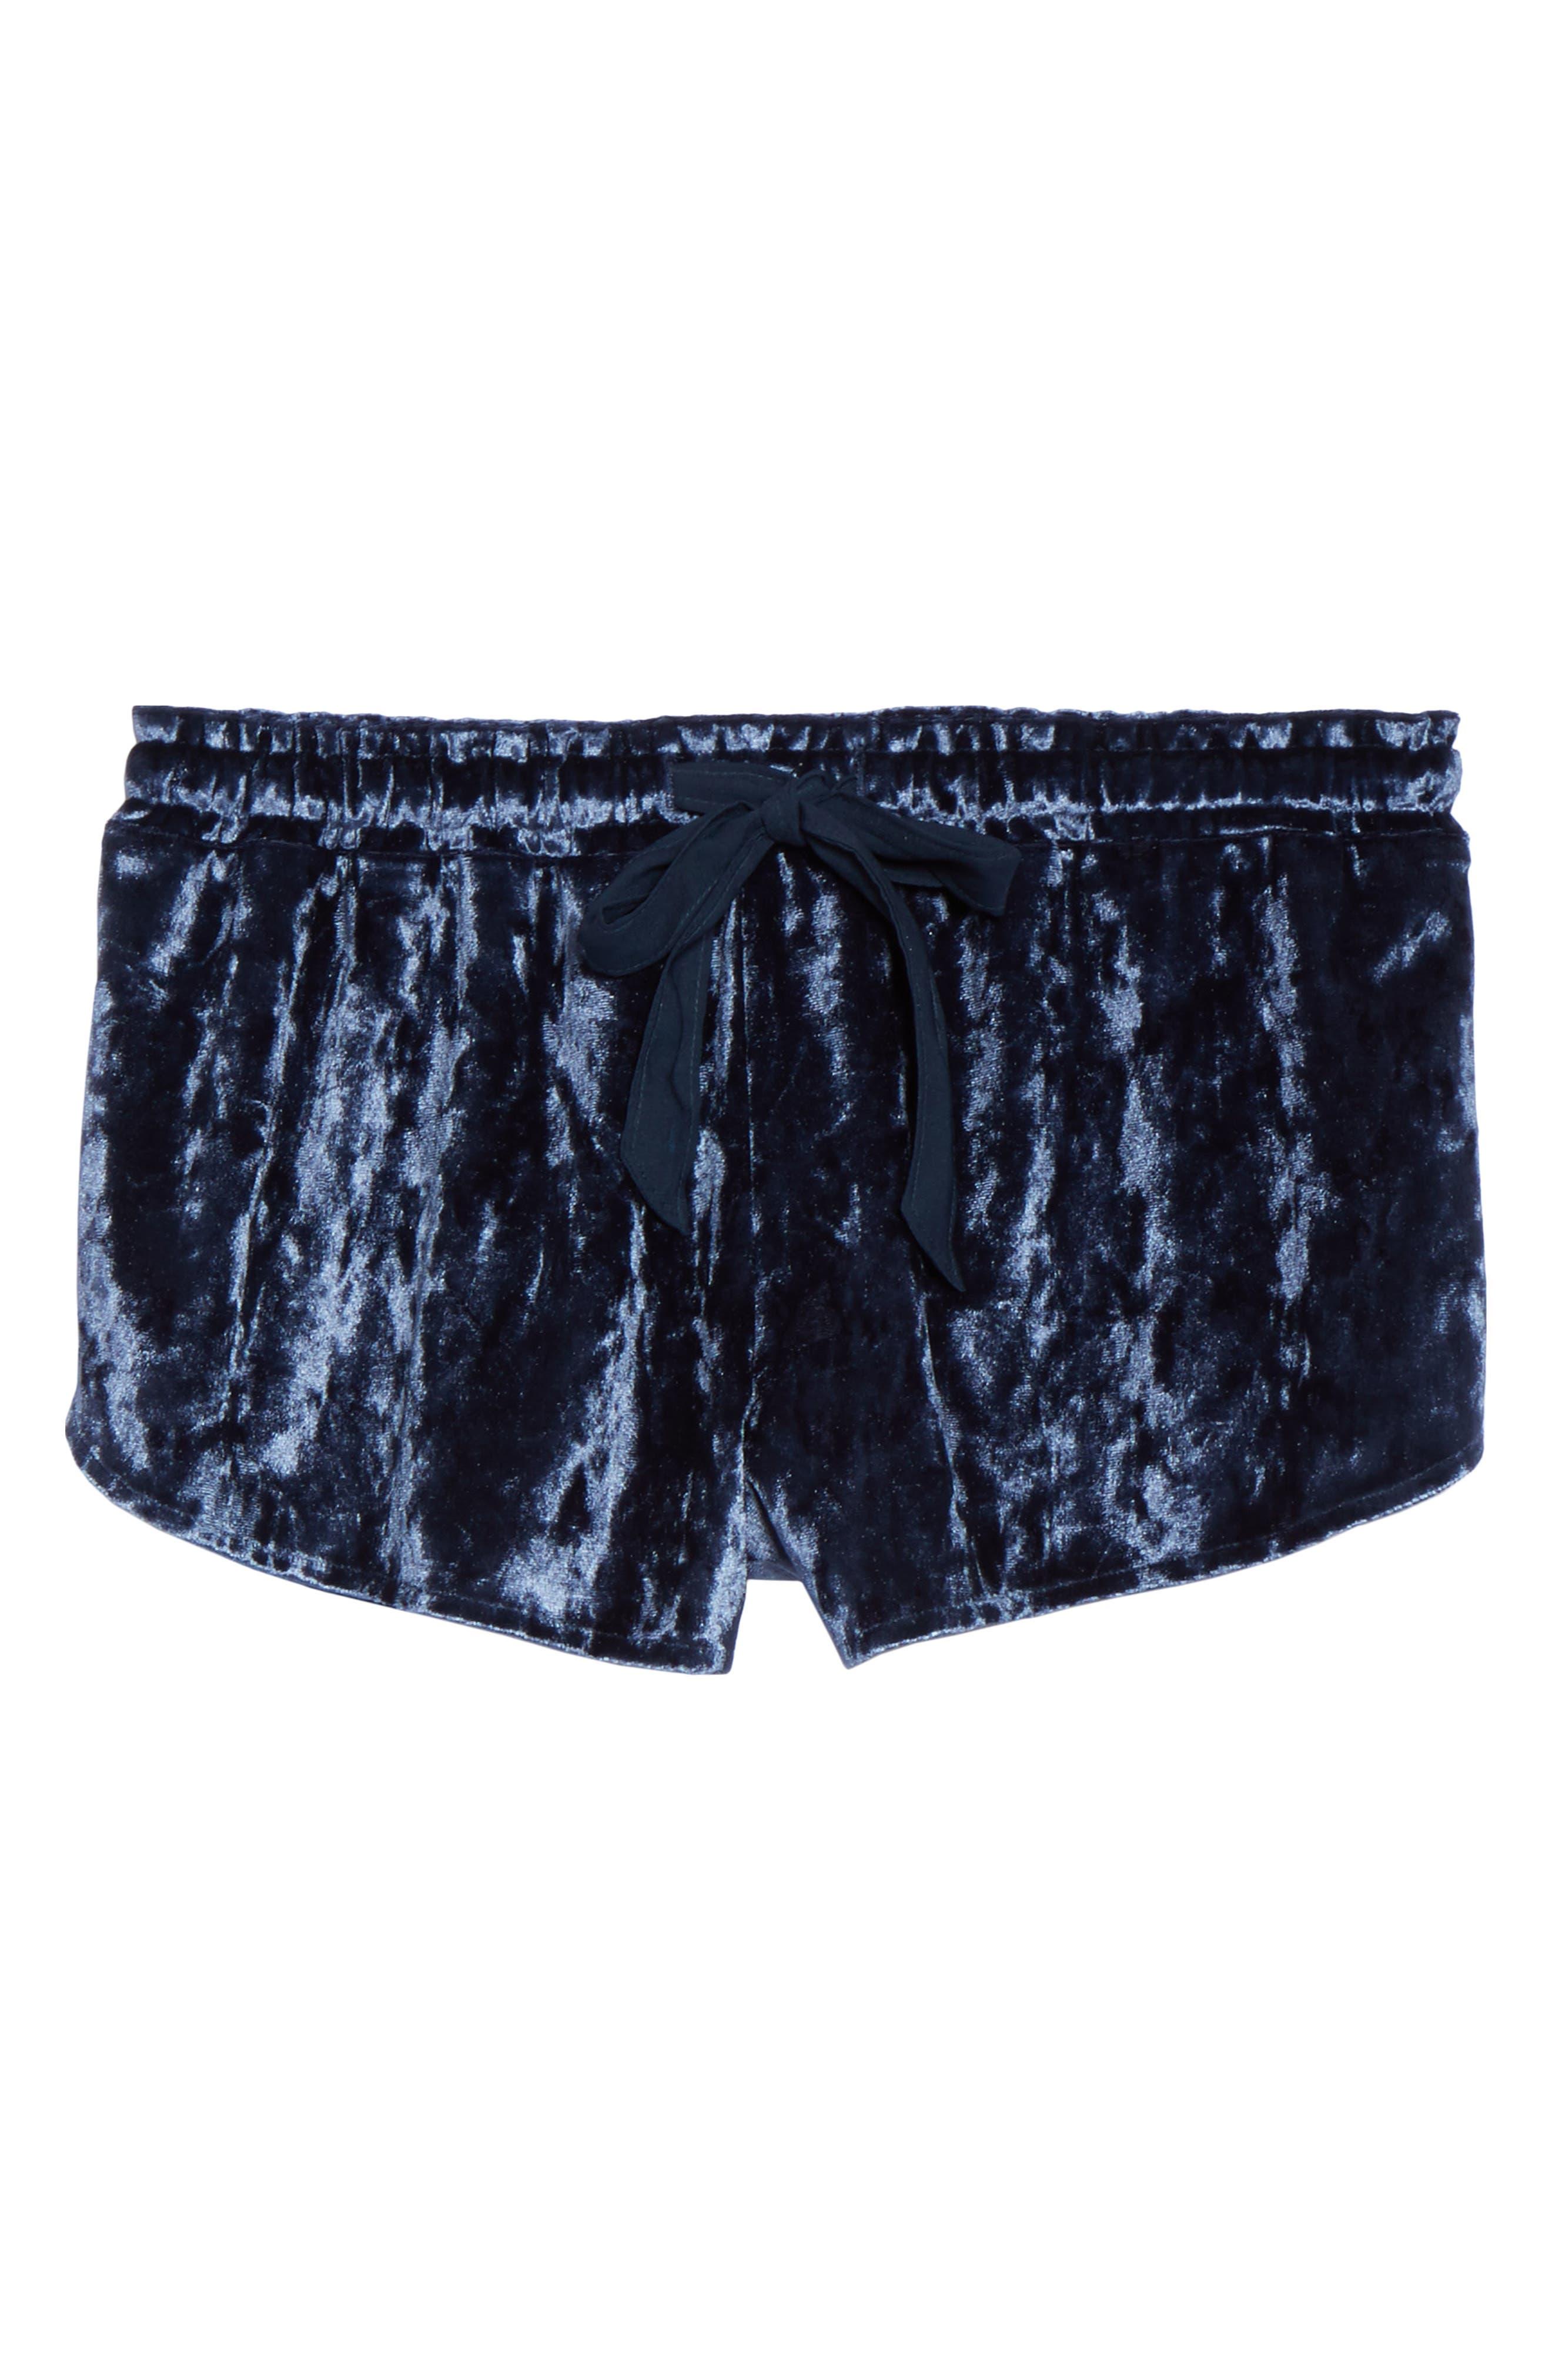 Starry Night Velvet Pajama Shorts,                             Alternate thumbnail 4, color,                             Navy Indigo